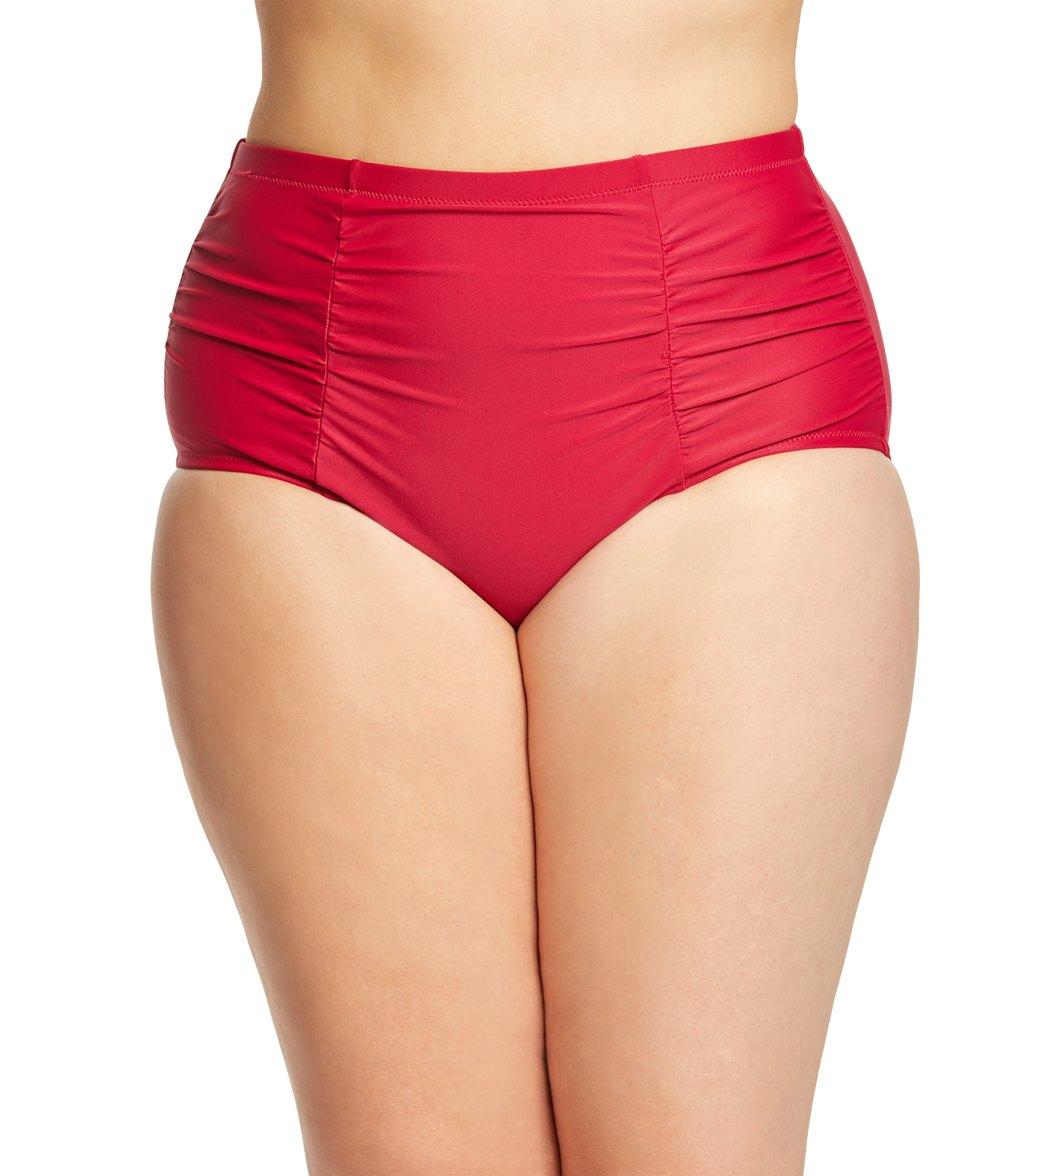 a4cffed609f Raisins Curve Plus Size Solid Costa High Waist Bikini Bottom at  SwimOutlet.com